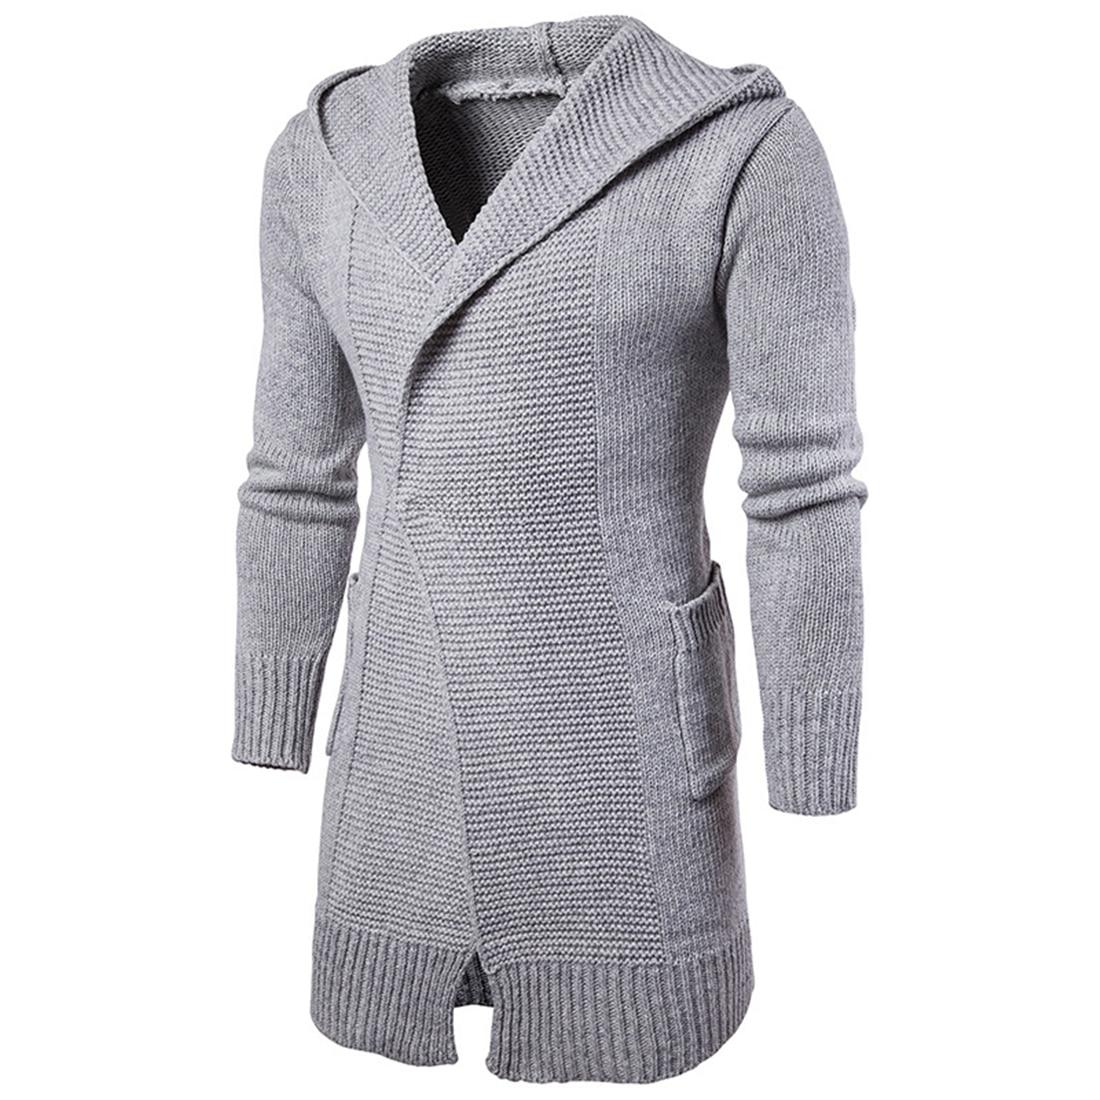 Fashion font b Men s b font Knit Single Button font b Sweater b font Coat